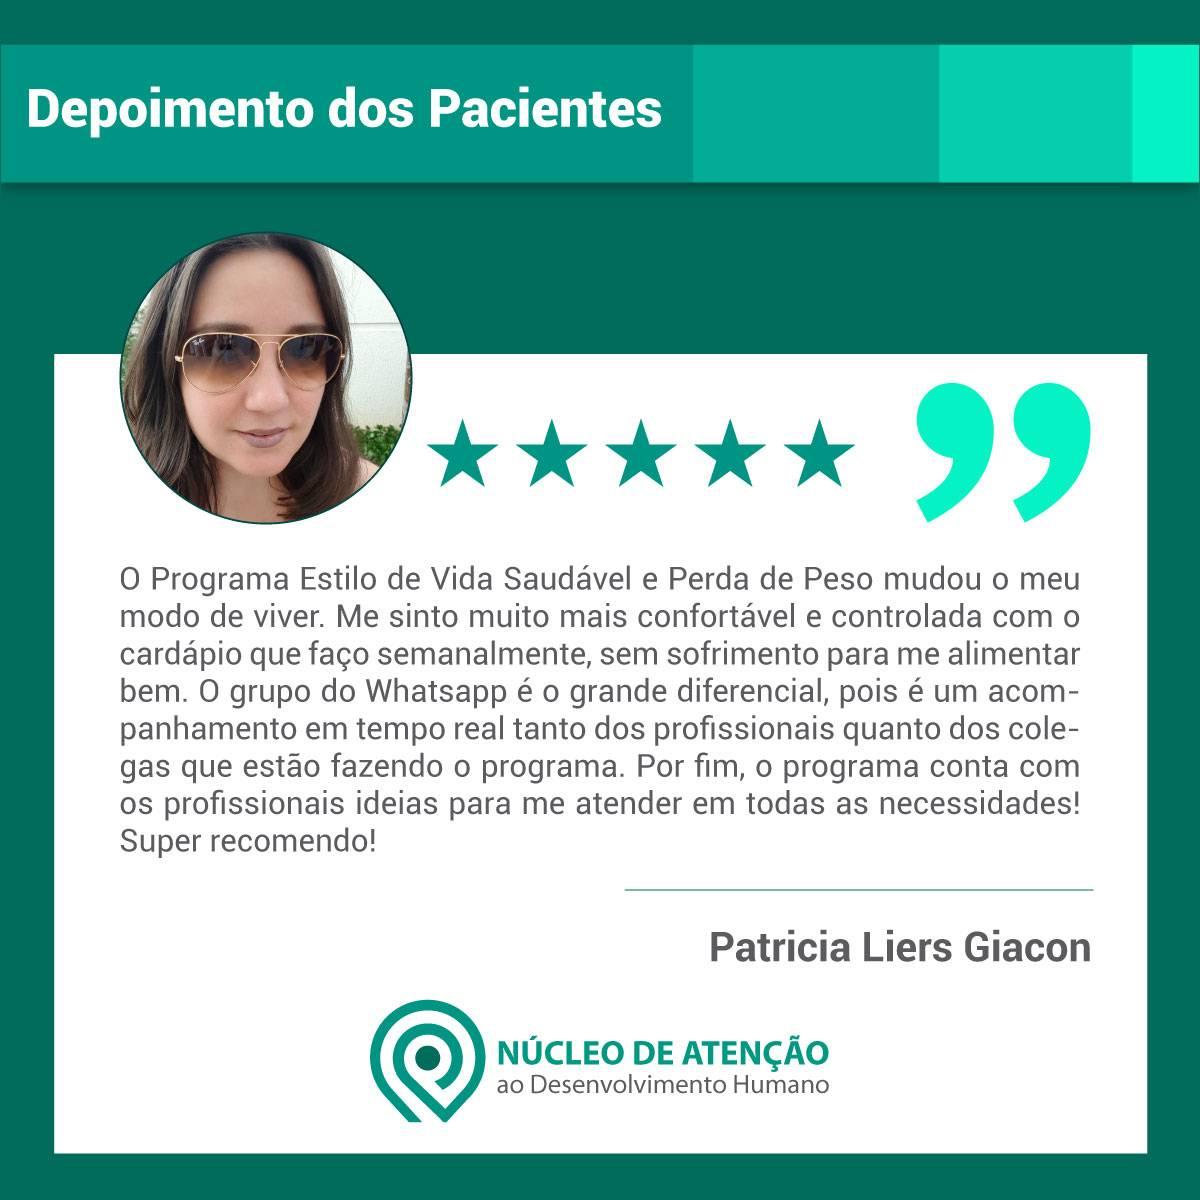 depoimento-dos-pacientes-patricia-giacon